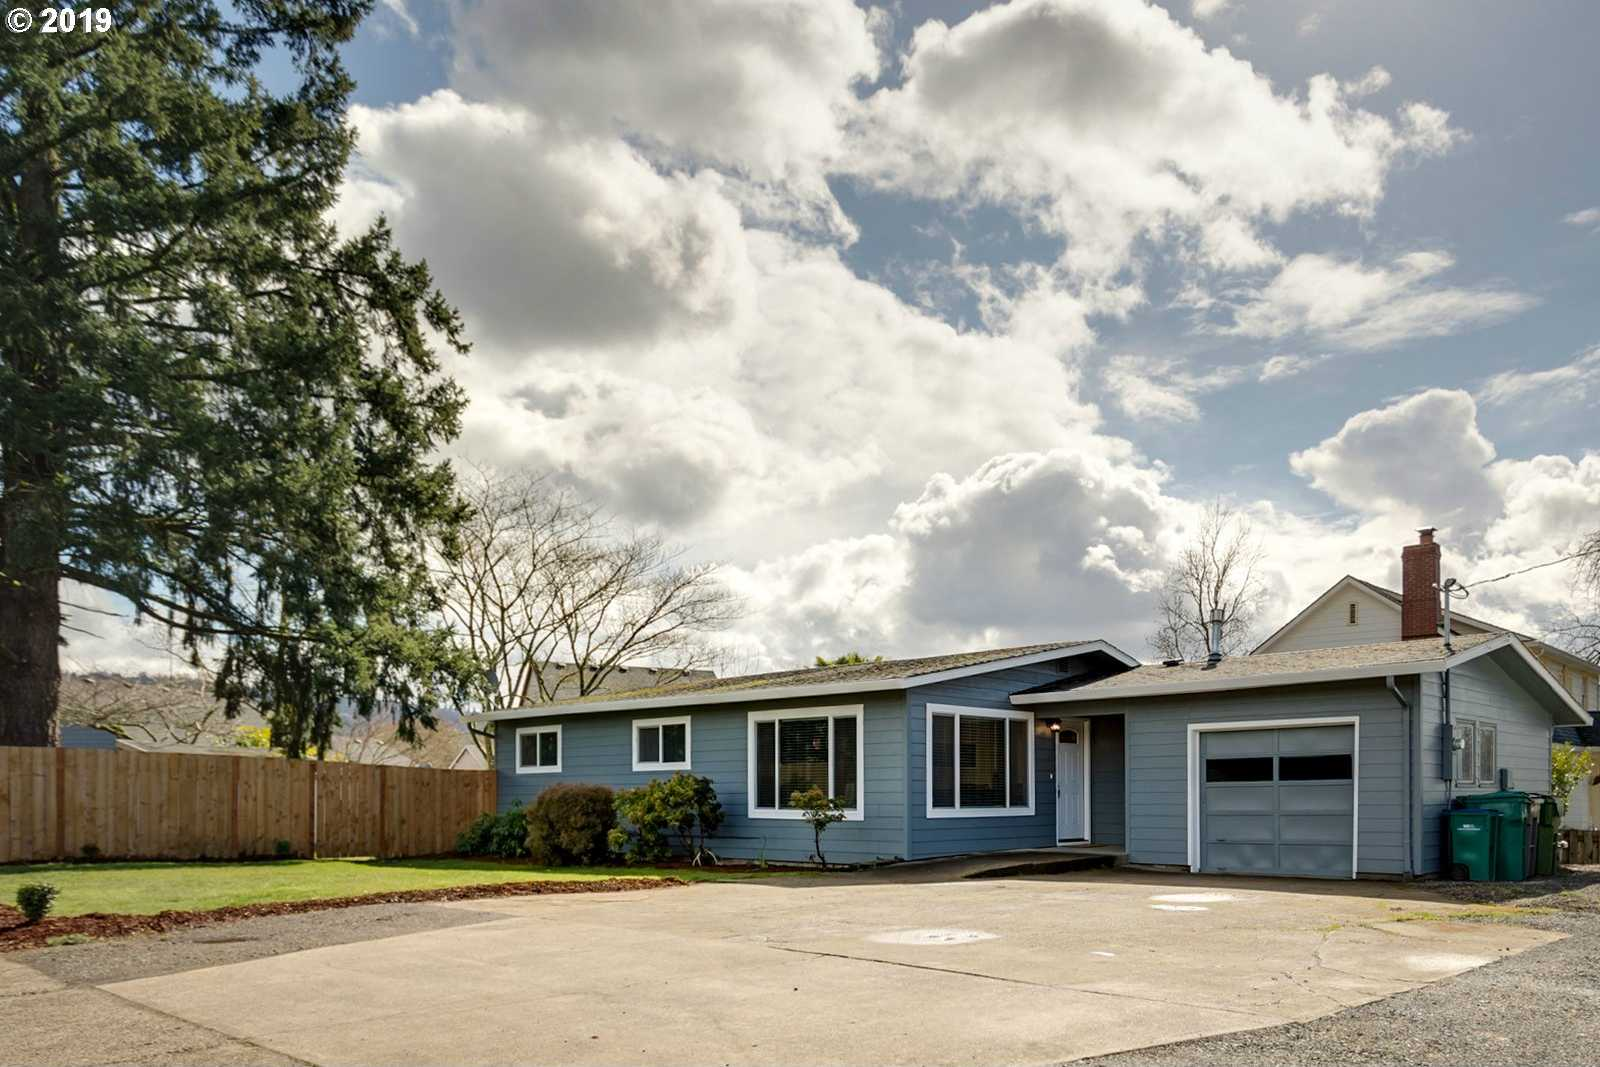 $334,900 - 3Br/2Ba -  for Sale in Rinkes Subdivision, Newberg